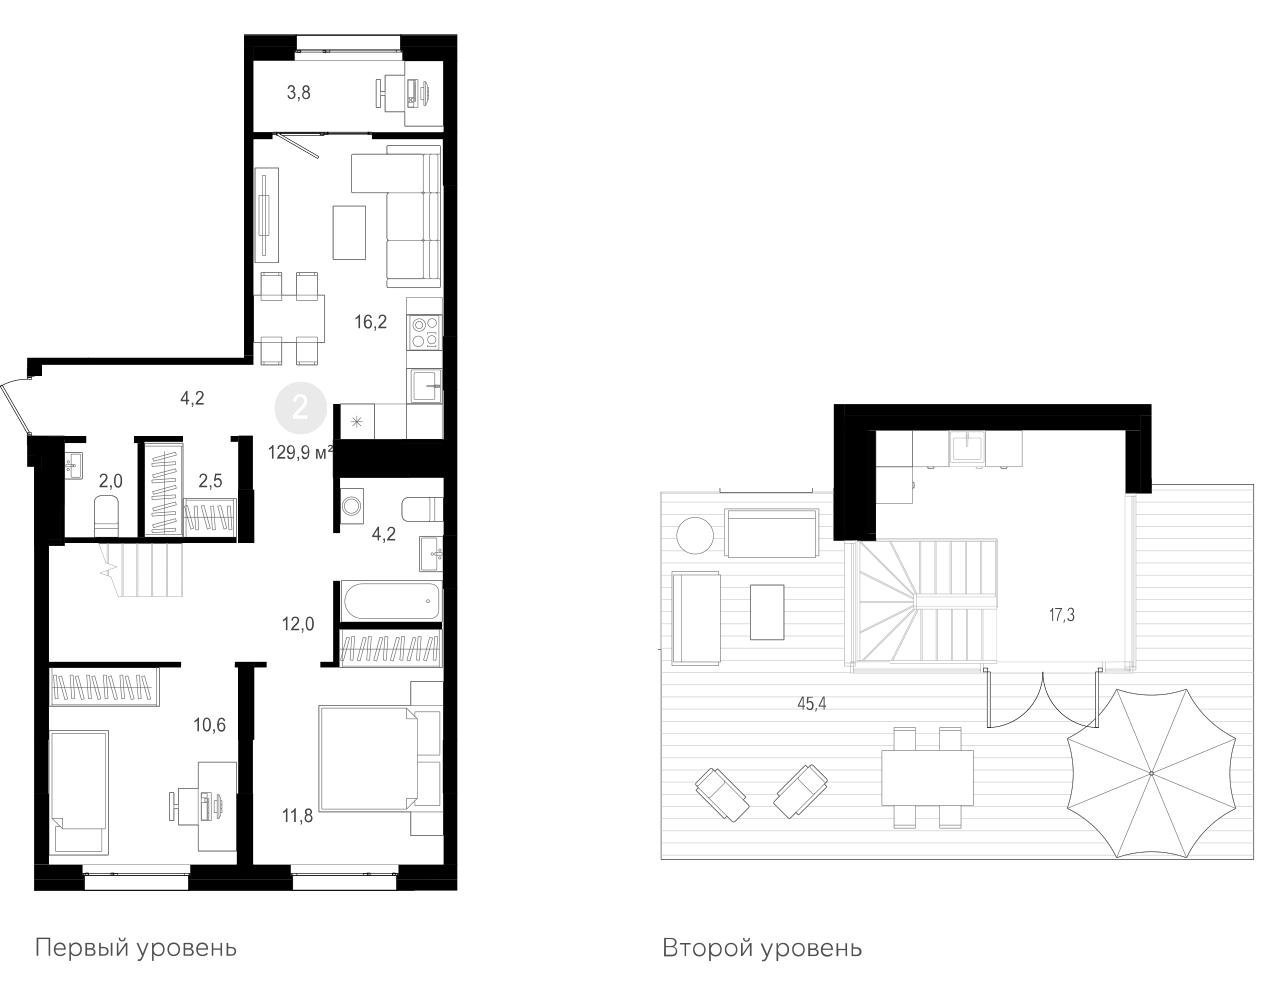 3Е-к.кв, 129.9 м²